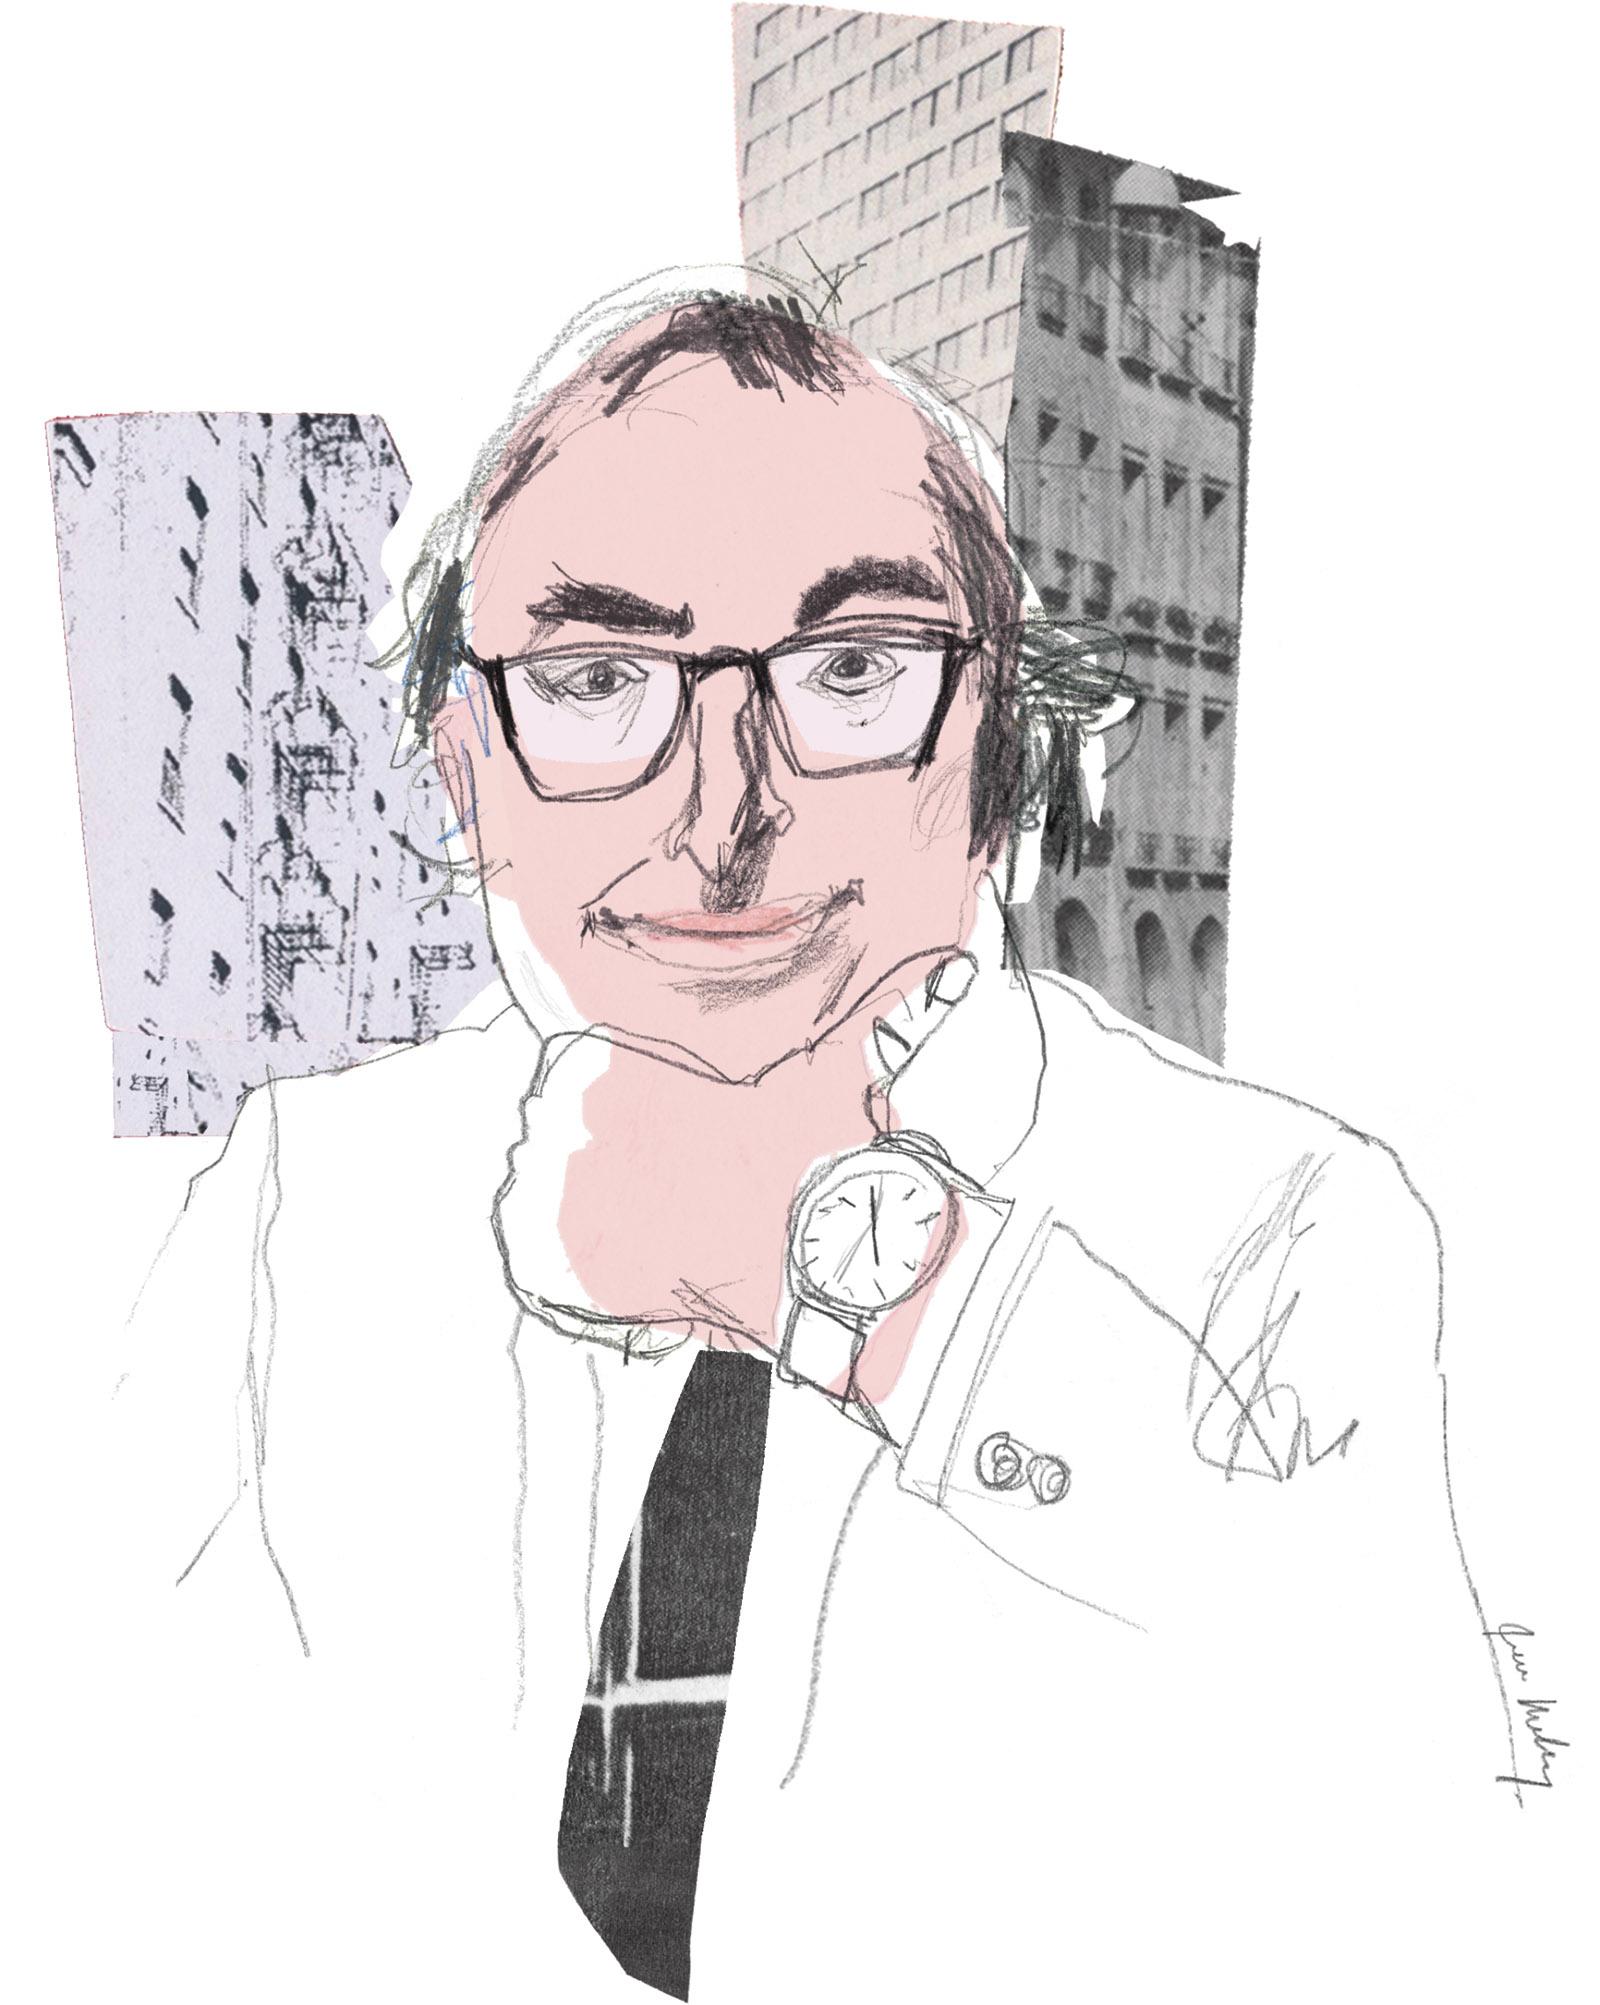 Gary Shteyngart; illustration by Joanna Neborsky